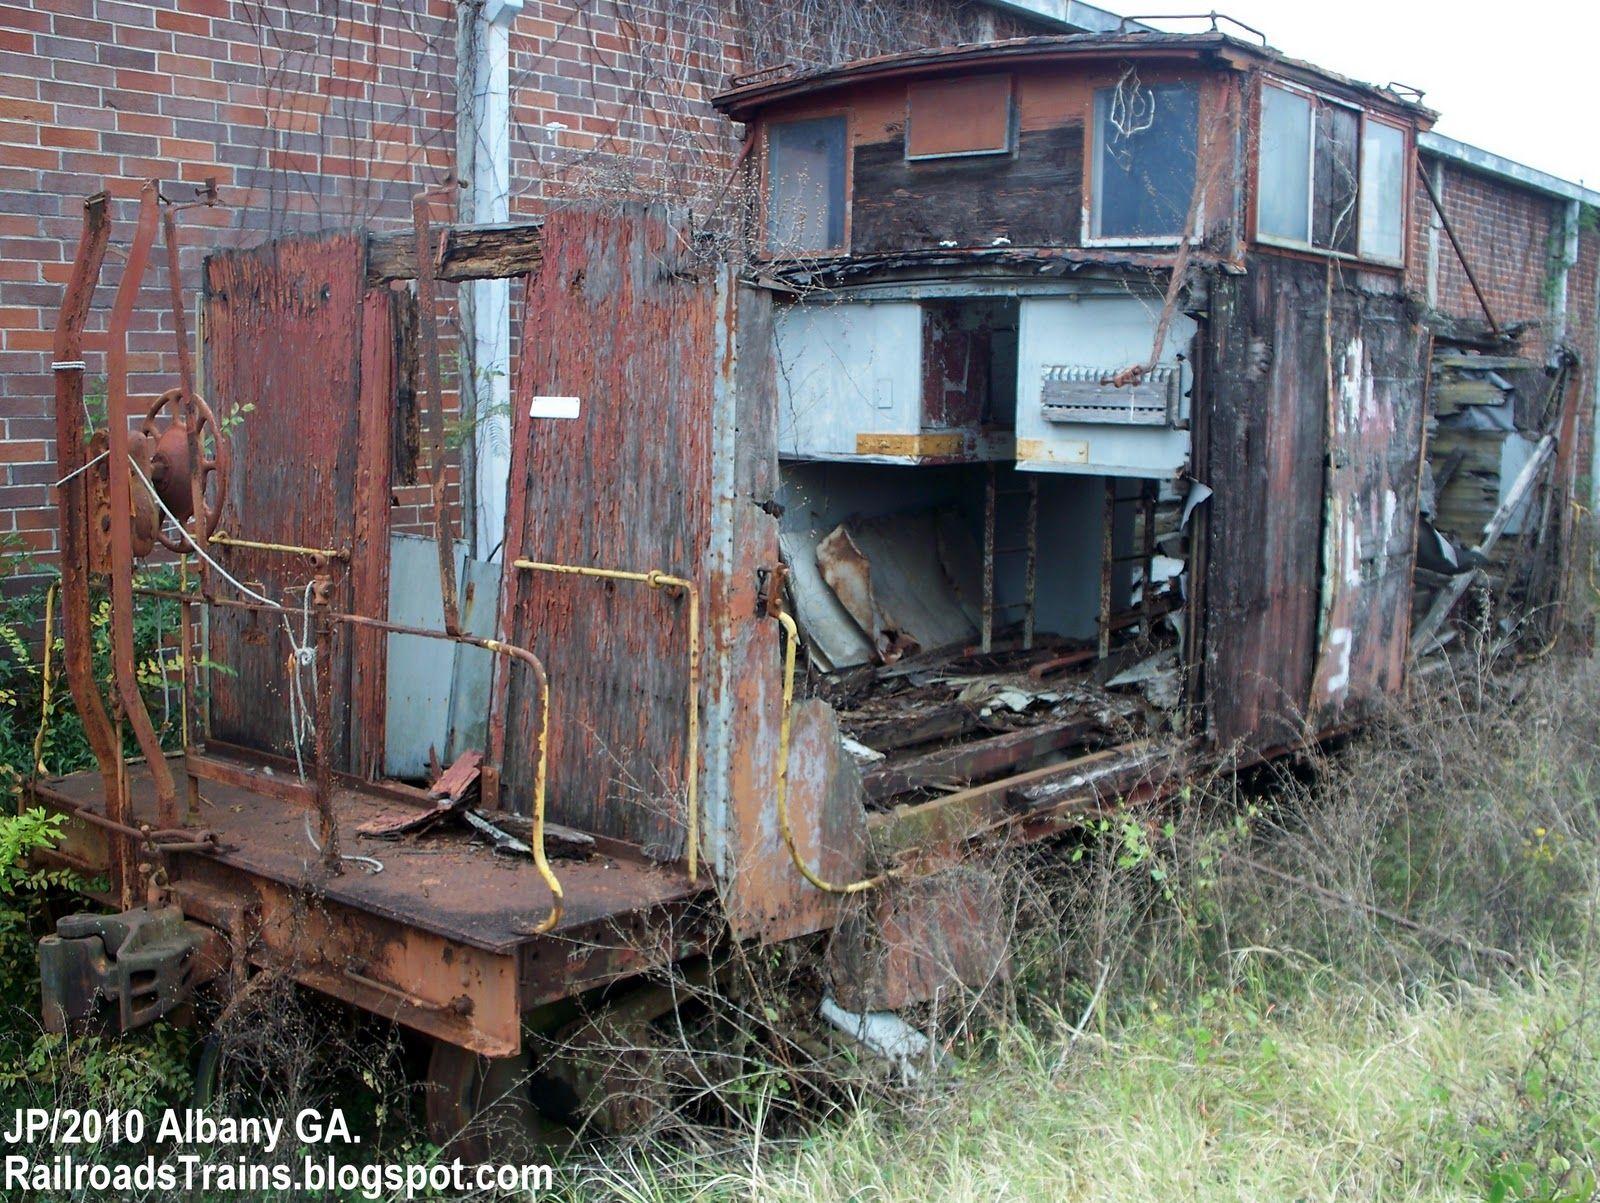 Rough+caboose+in+Albany+GA.+on+Georgia++Florida+Railway+track+siding.jpg (1600×1203)